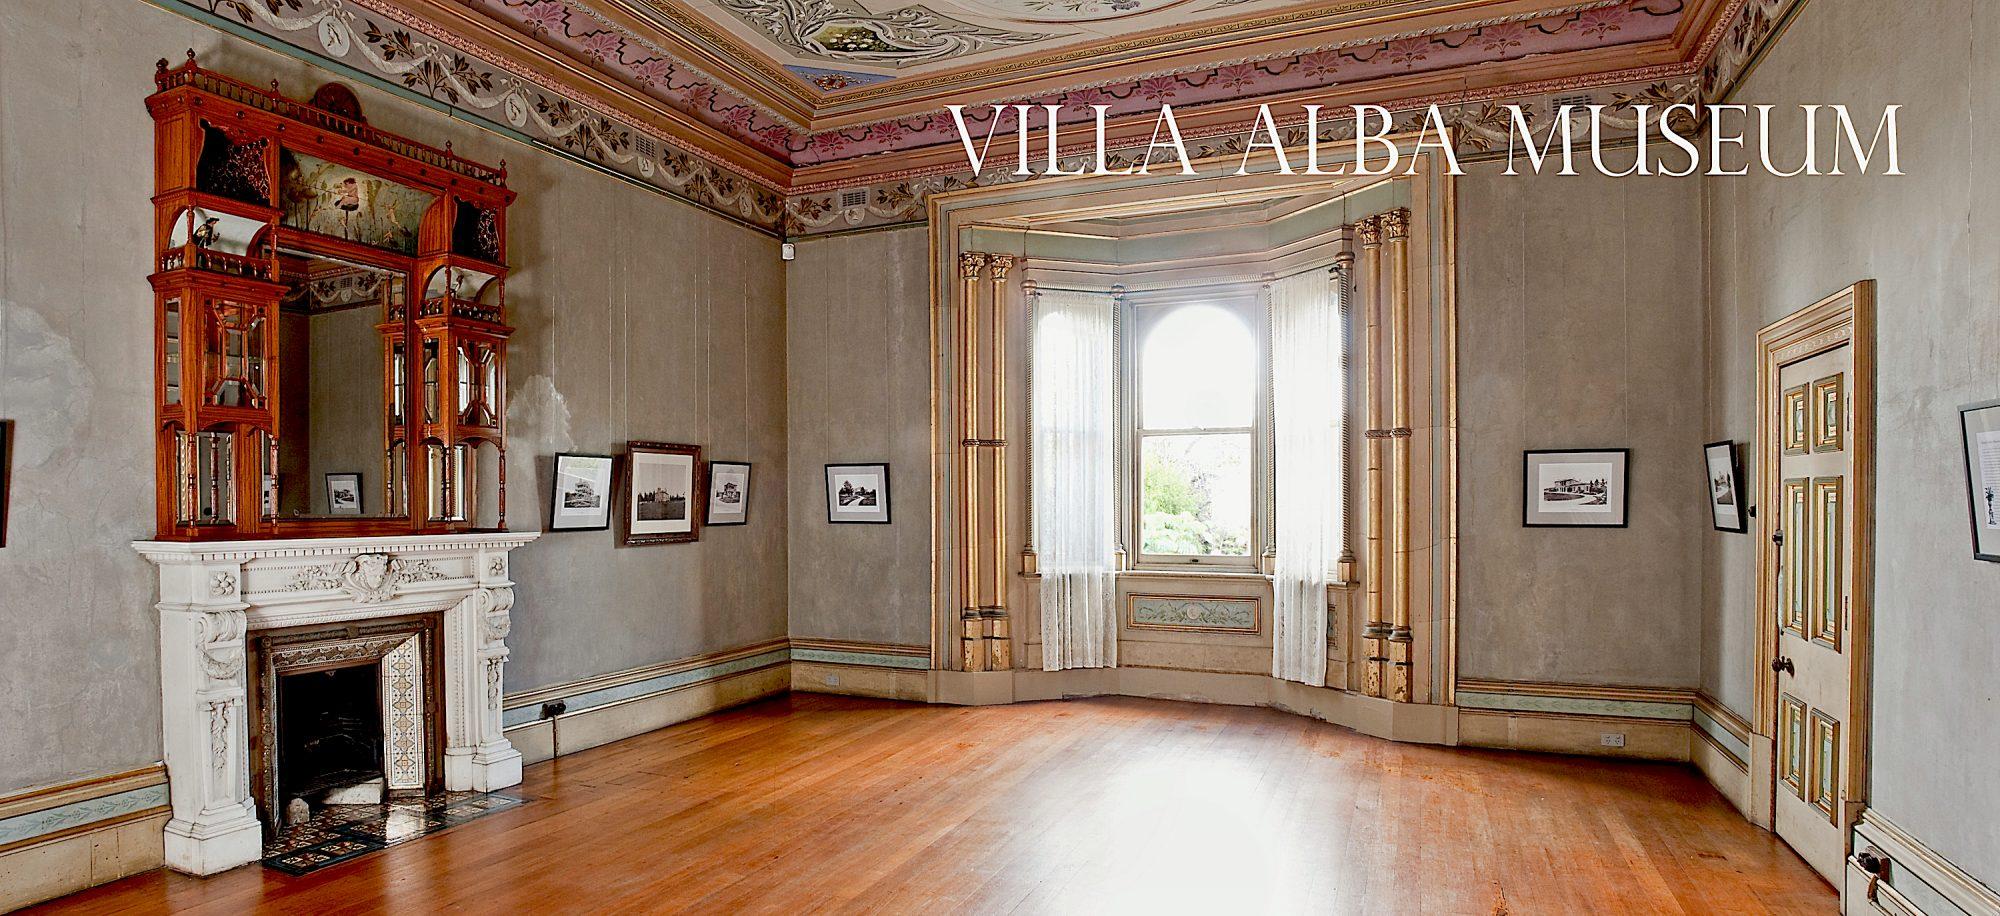 Villa Alba Museum